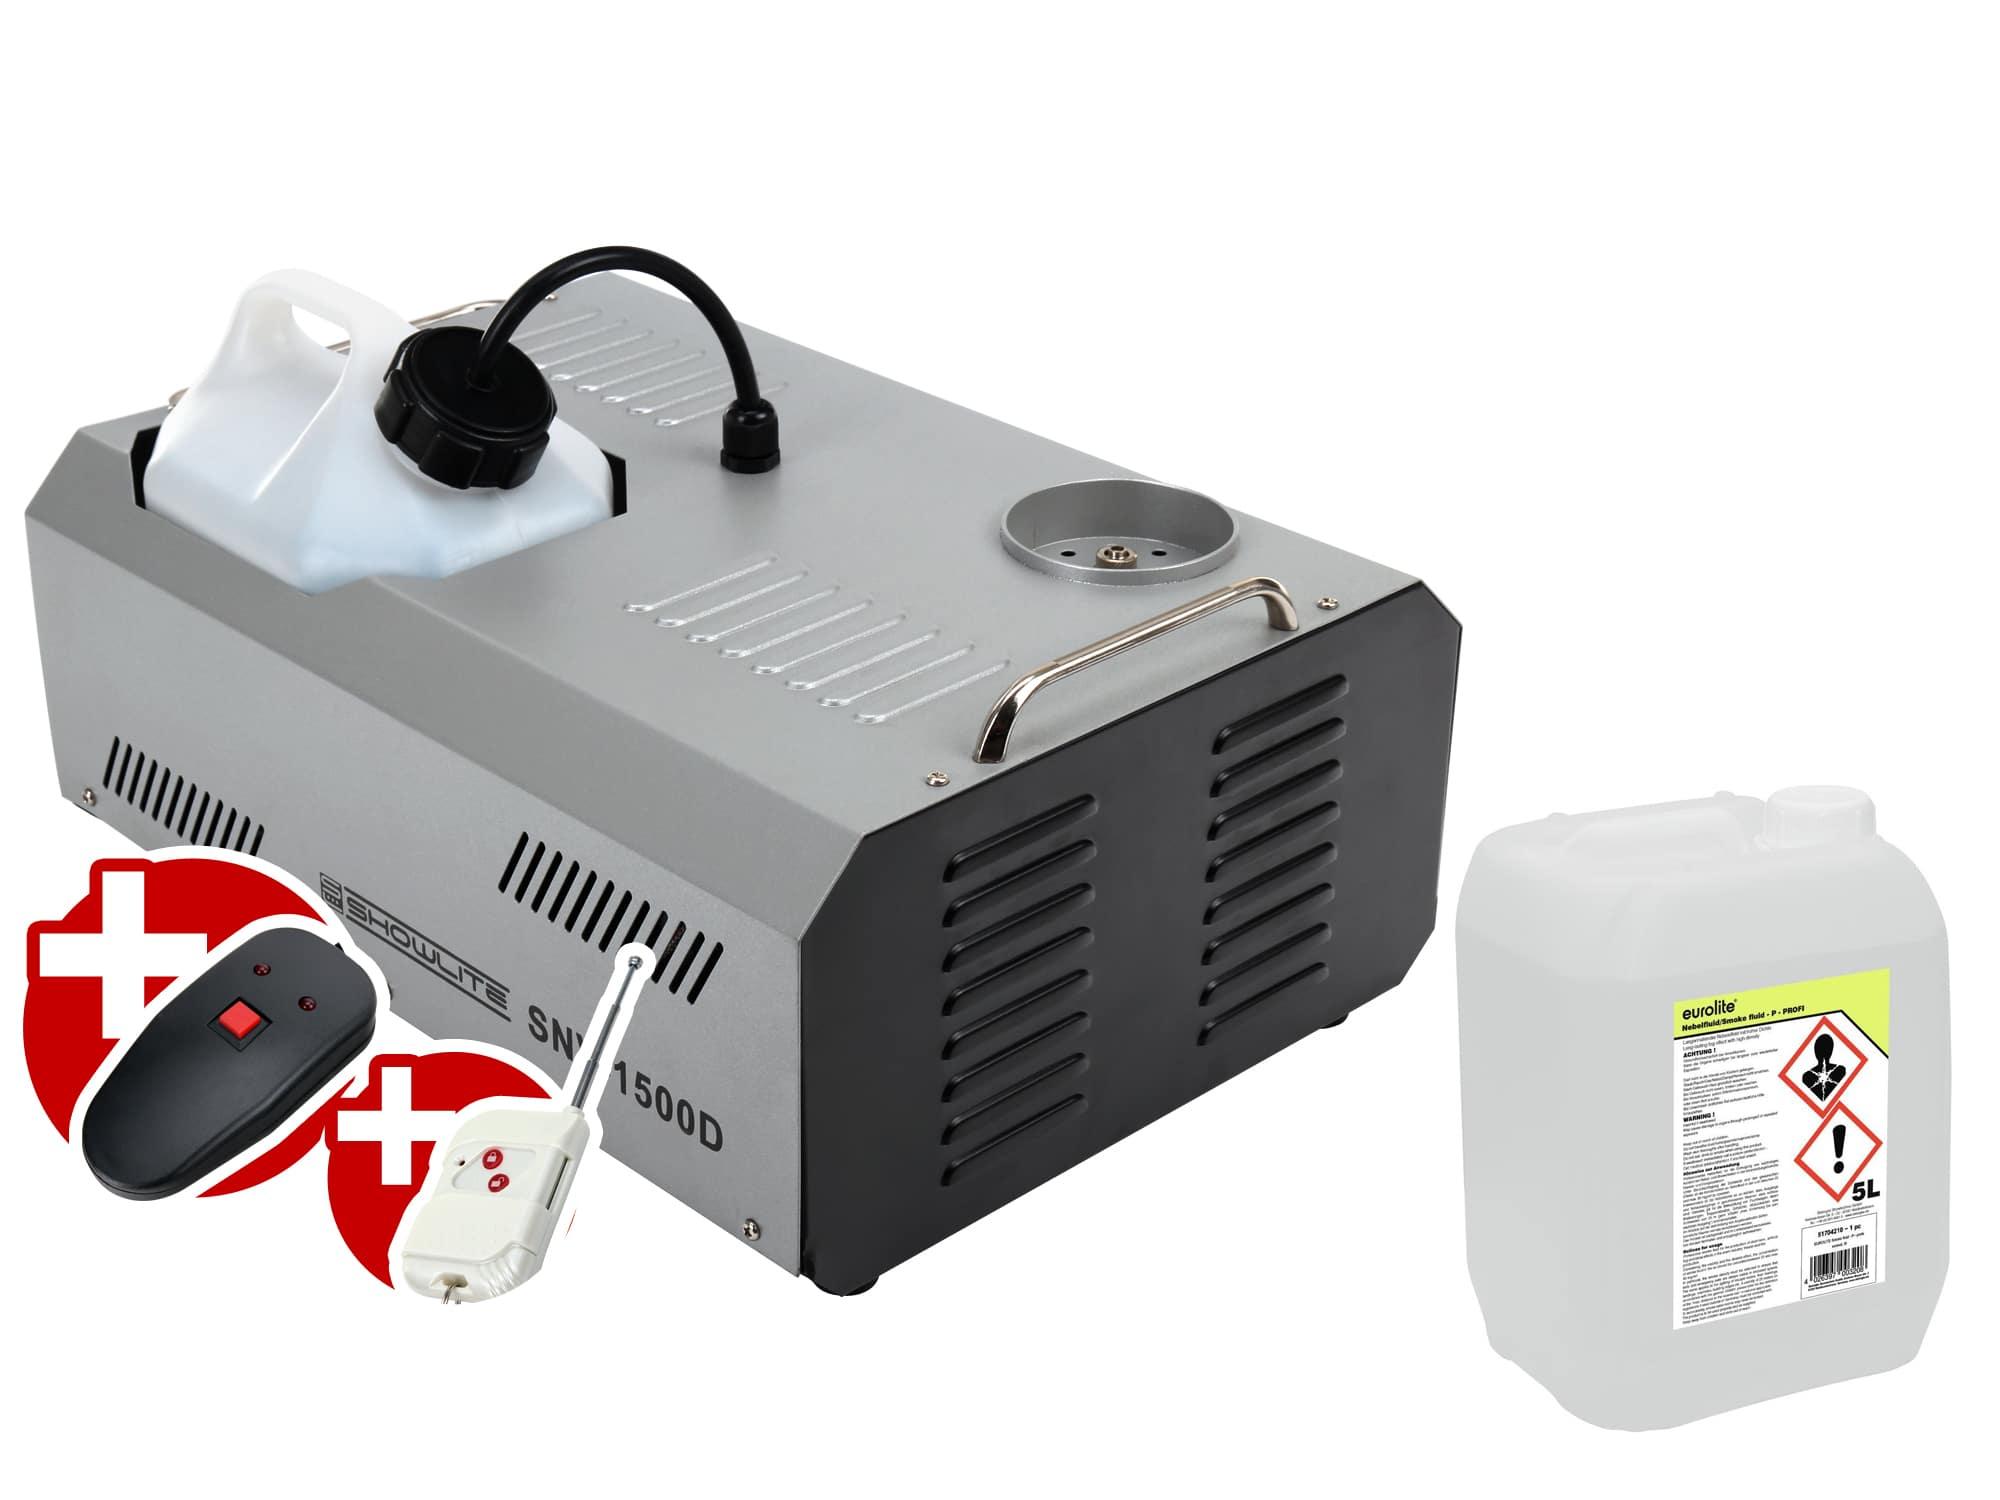 Komplettset Showlite SNV 1500D DMX Vertikal Nebelmaschine 1500W inkl. Fernbedienung 5 L Nebelfluid